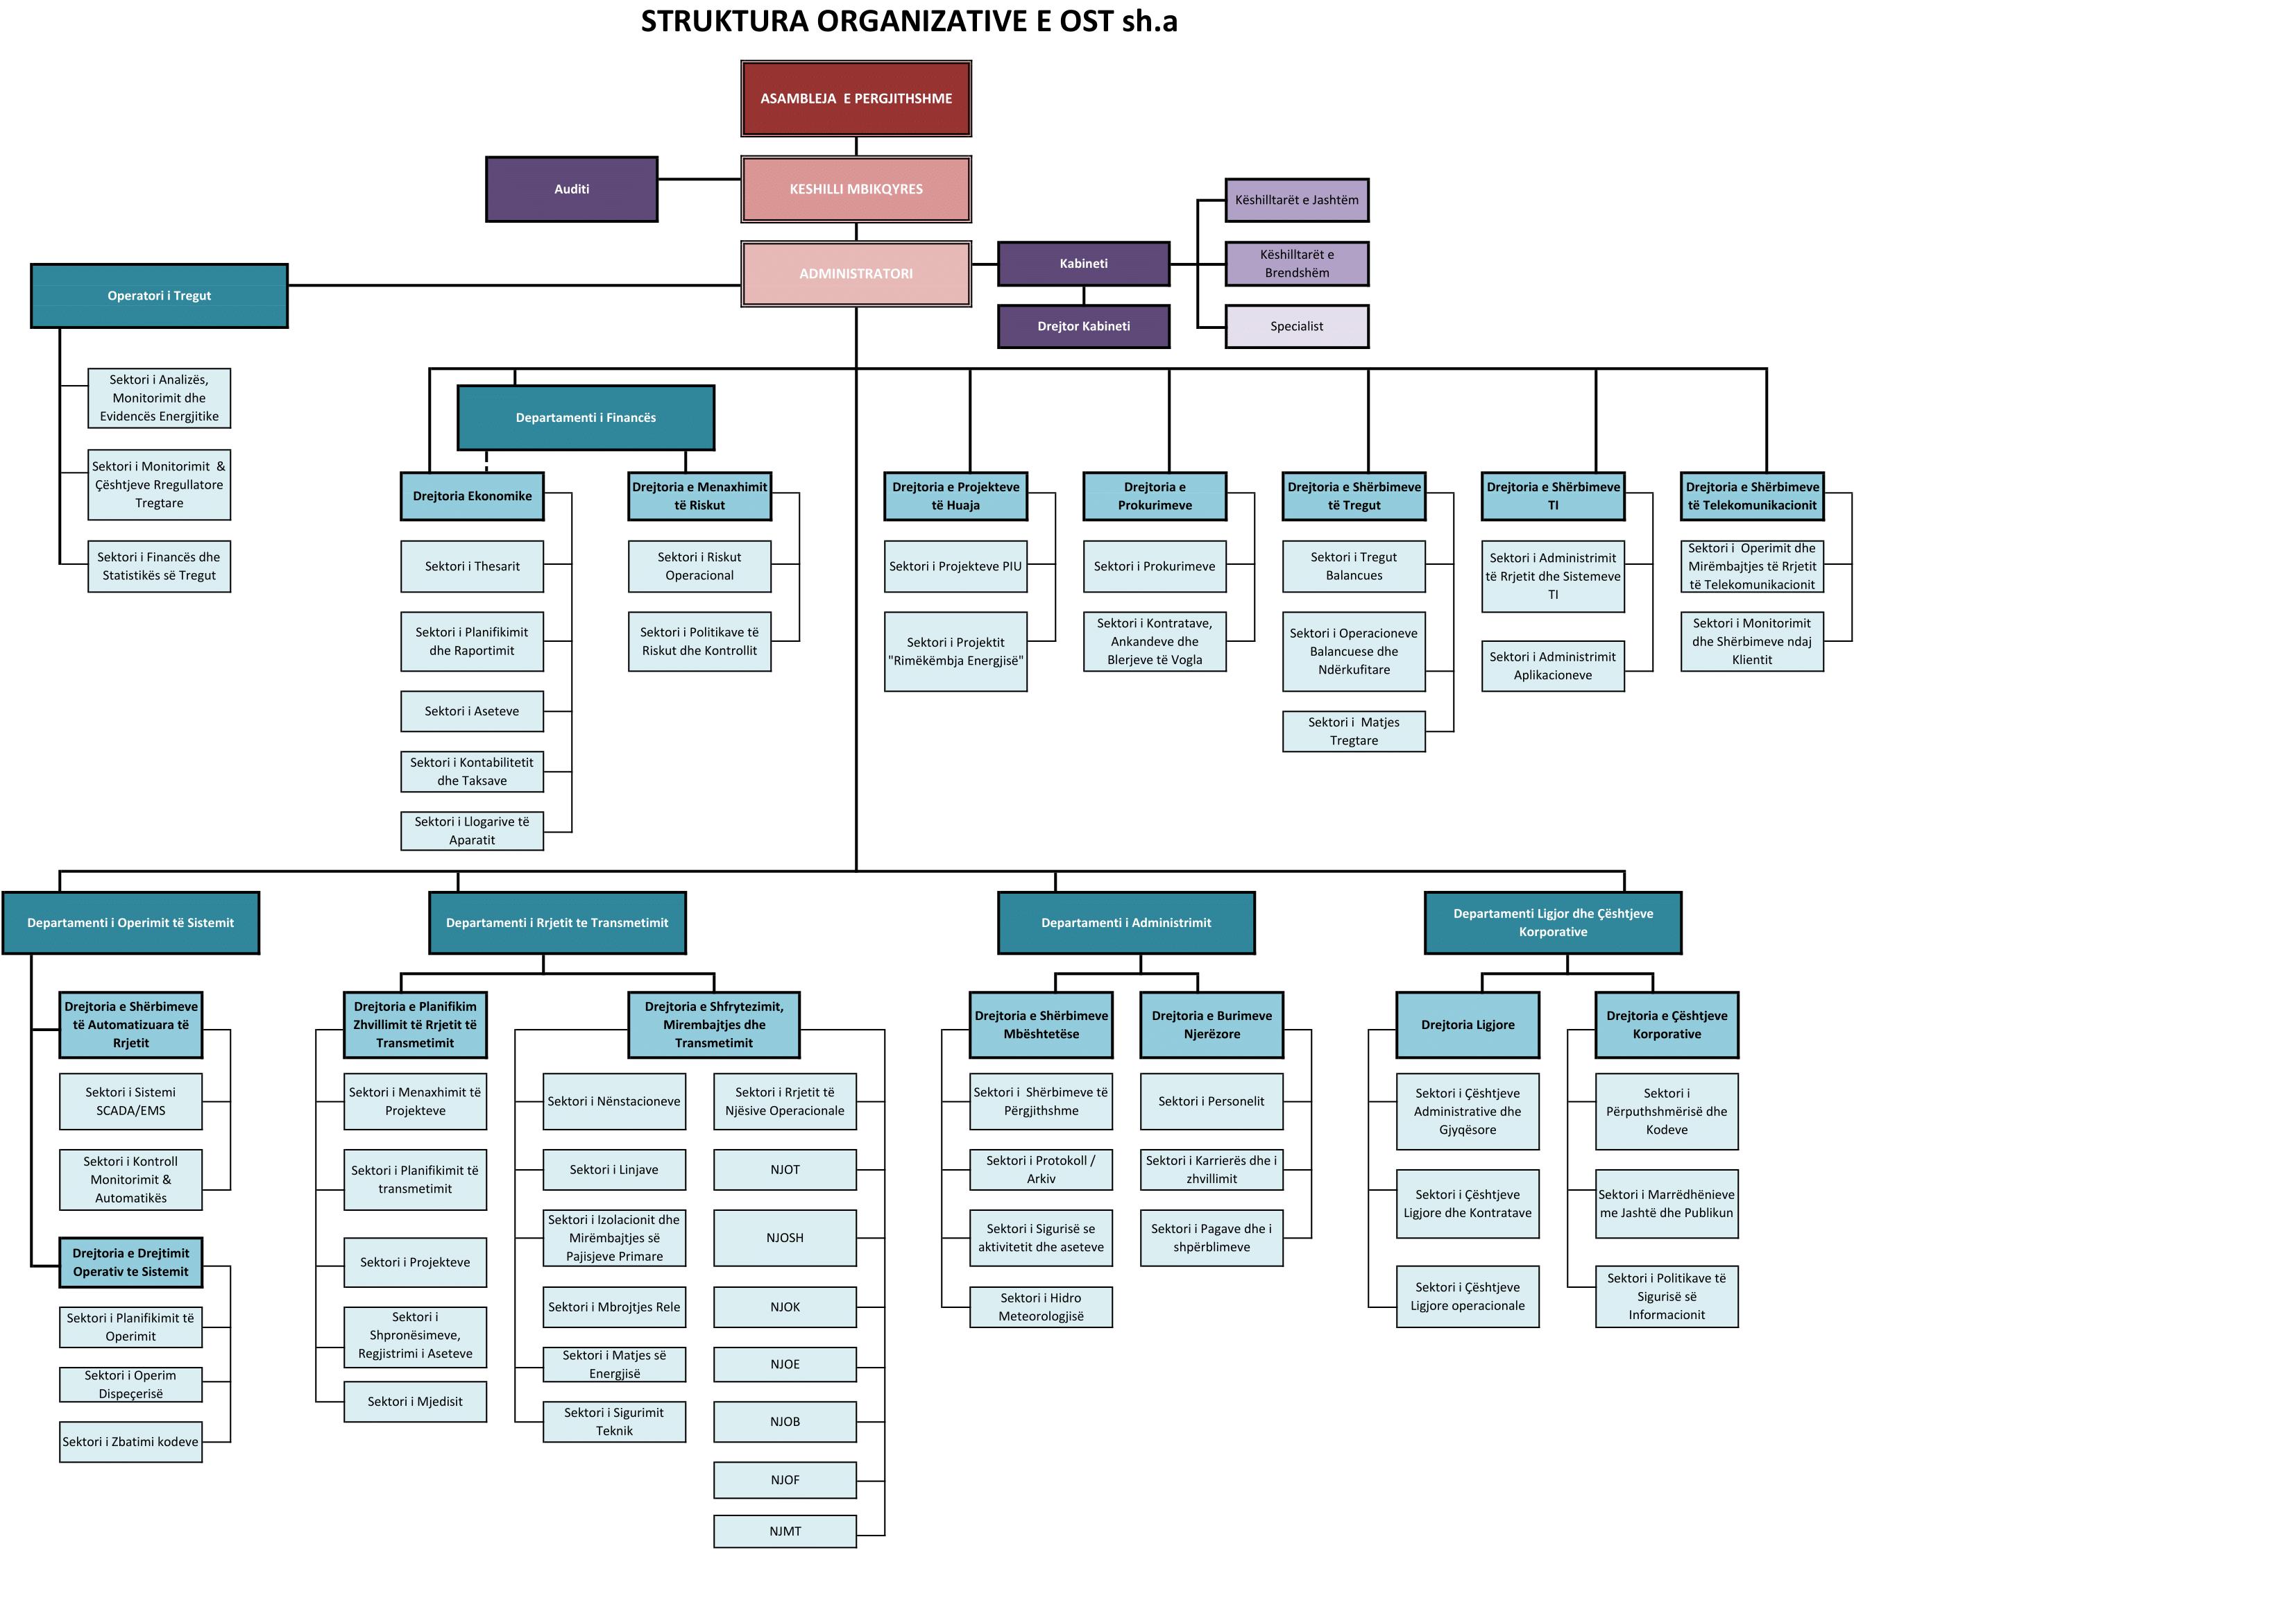 https://www.ost.al/wp-content/uploads/2018/06/Struktura-Organizative-OST-sh.a.pdf